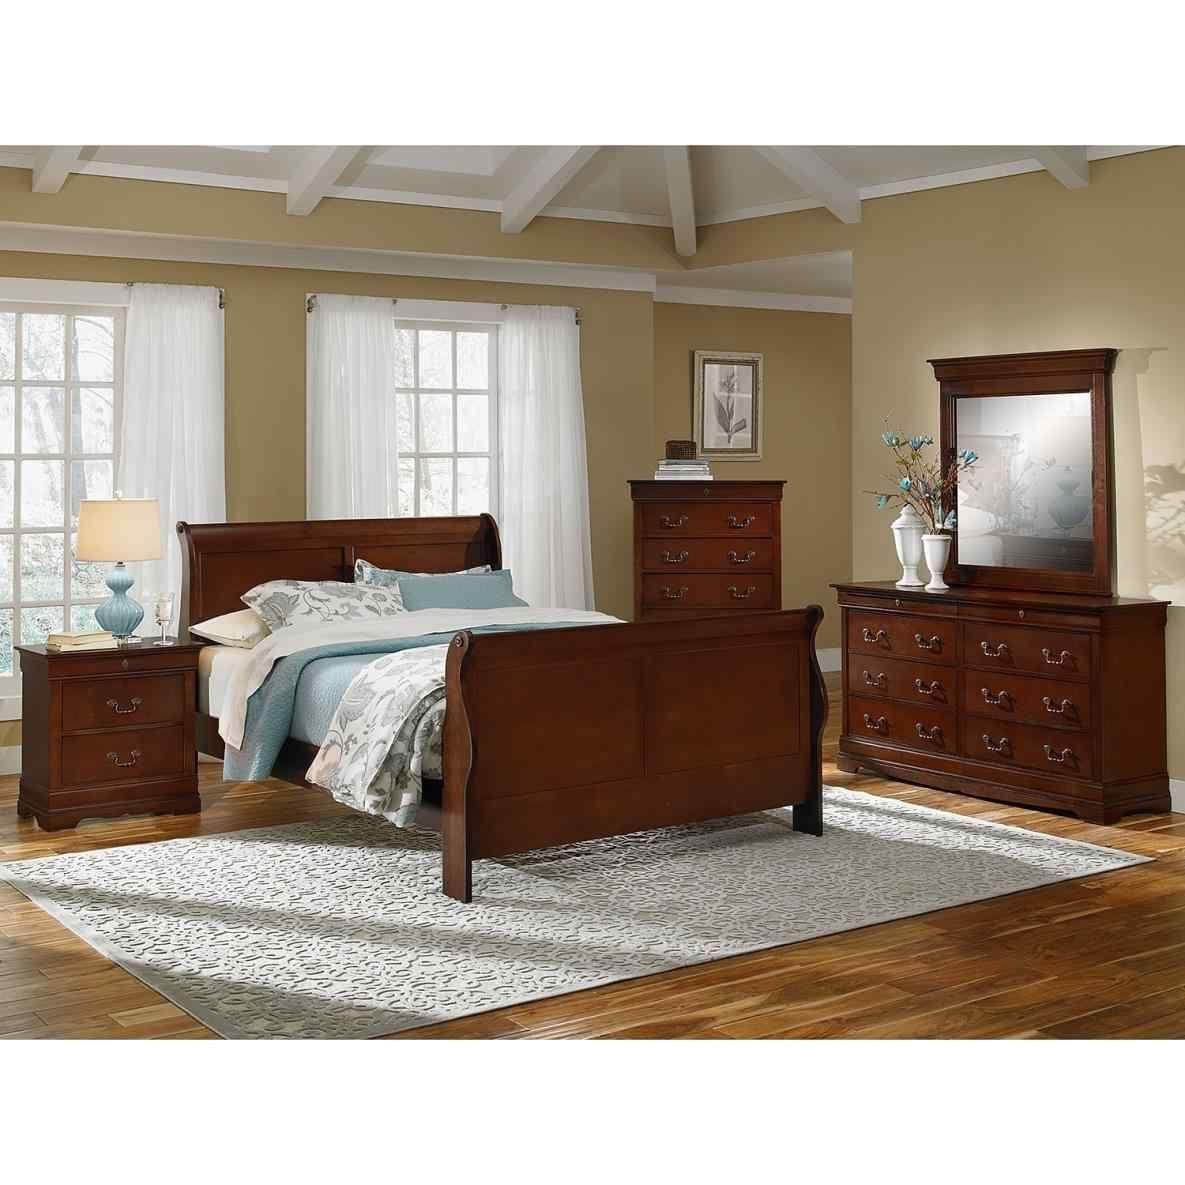 used thomasville bedroom furniture interior design master